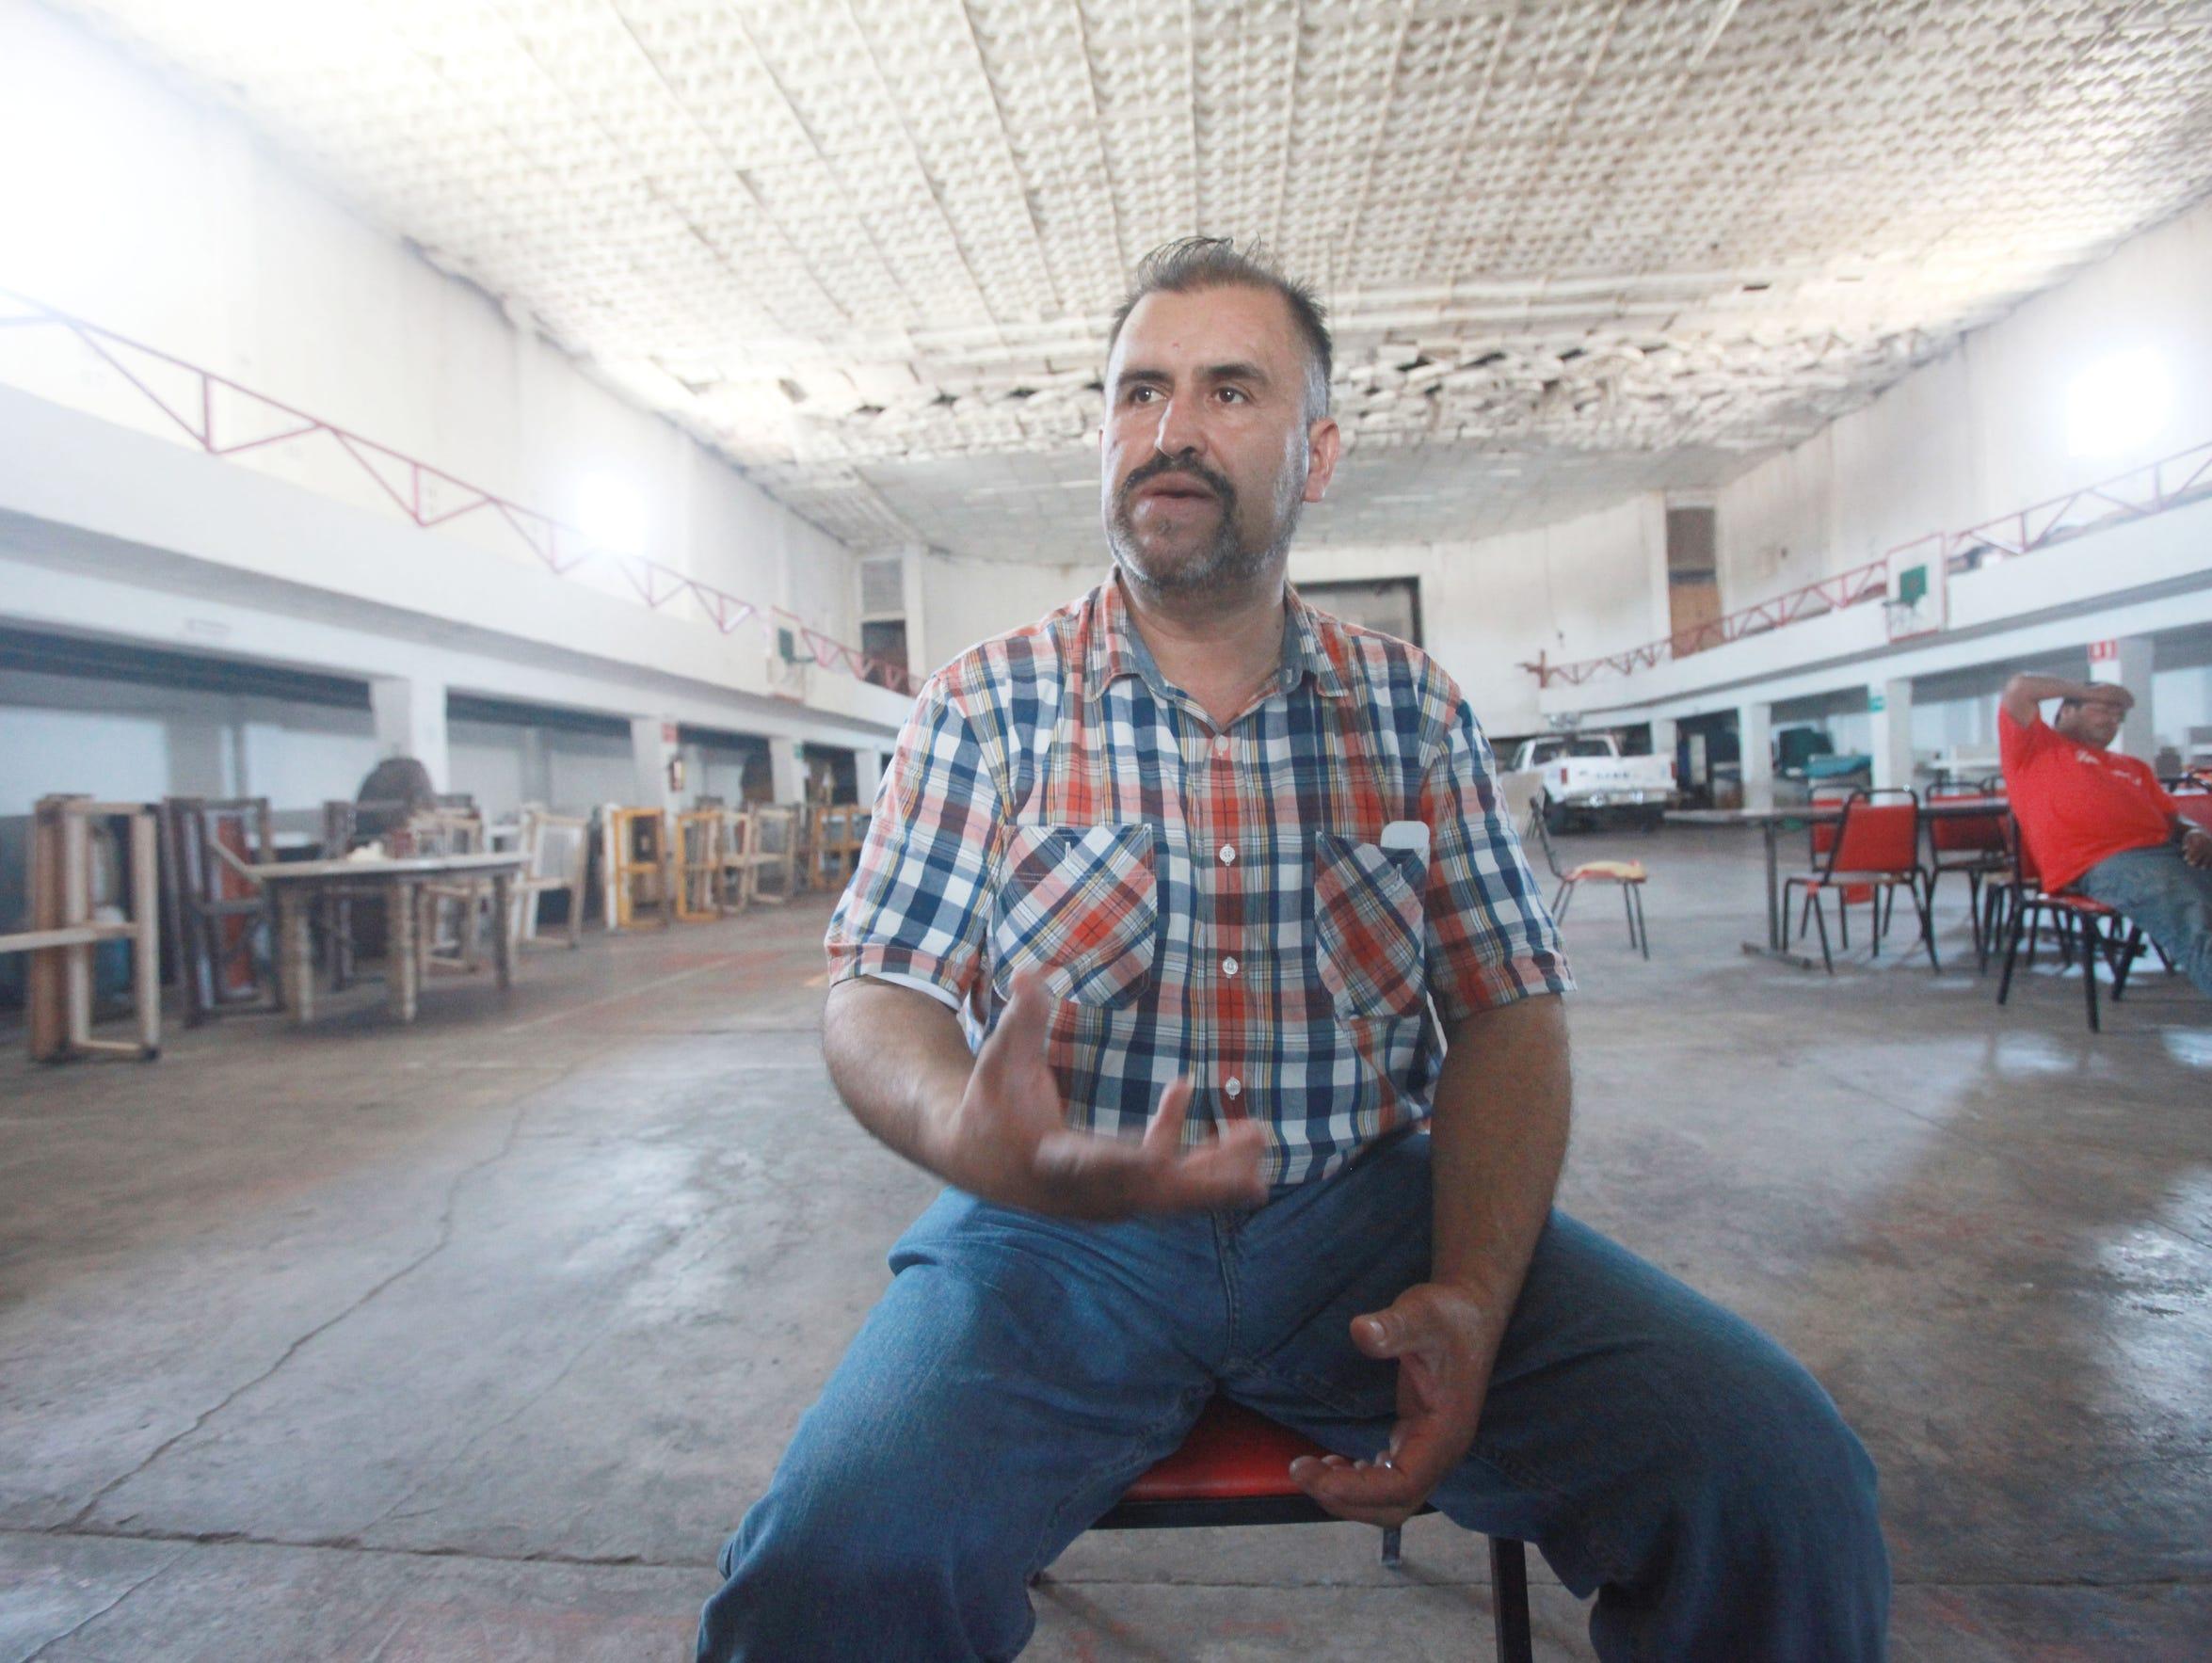 Gonzalo Pacheco runs Grupo de Ayuda, a migrant shelter